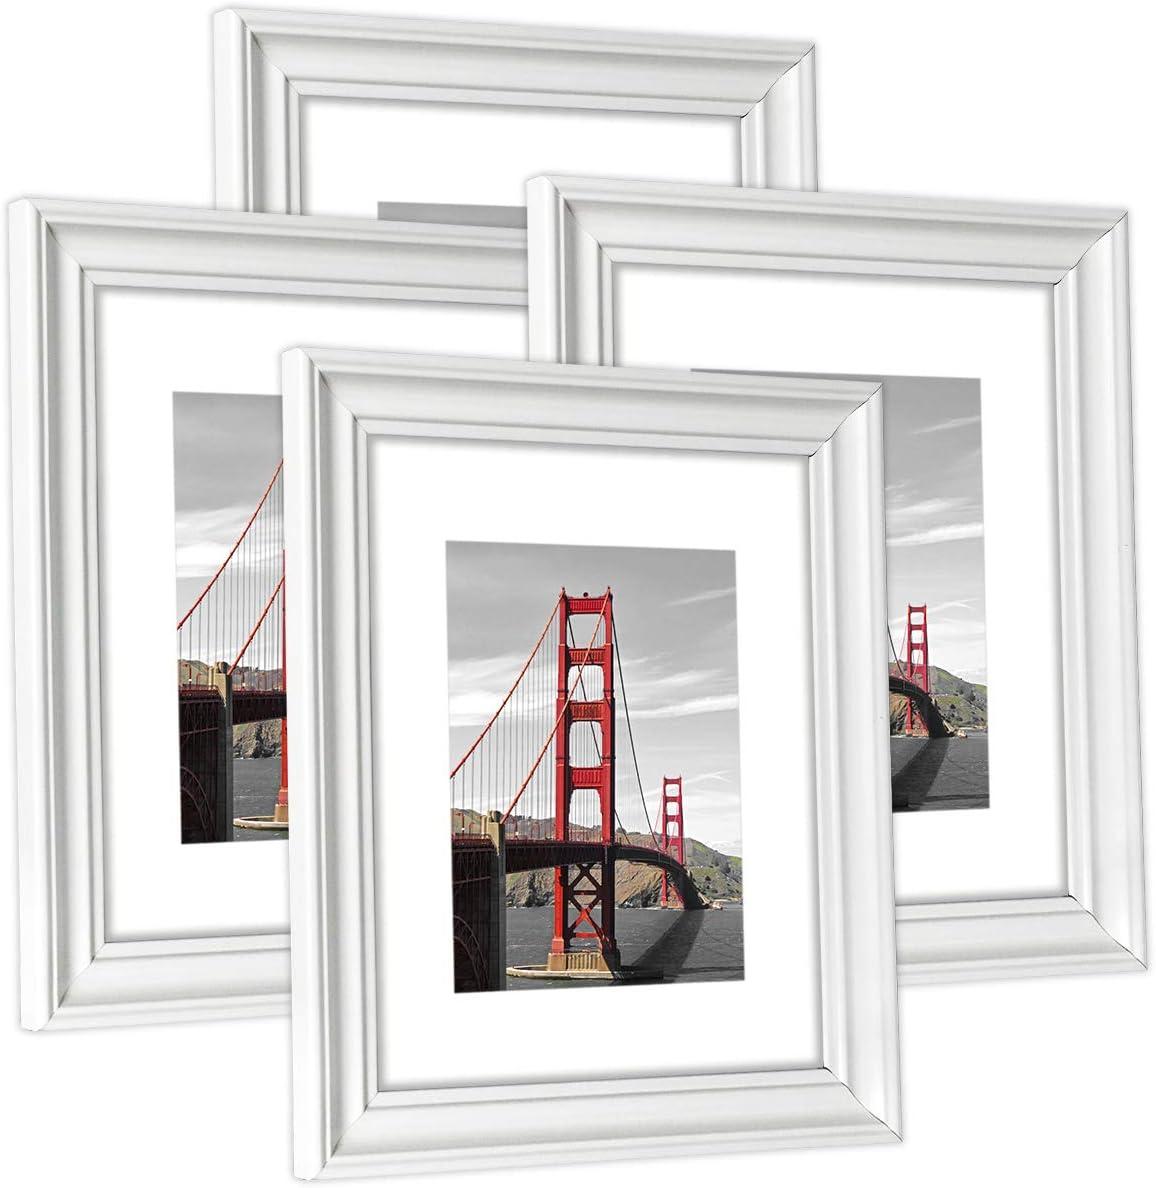 Hap Tim 8x10 Branded goods Picture Frame White Frames New arrival for Photo Tableto Wooden